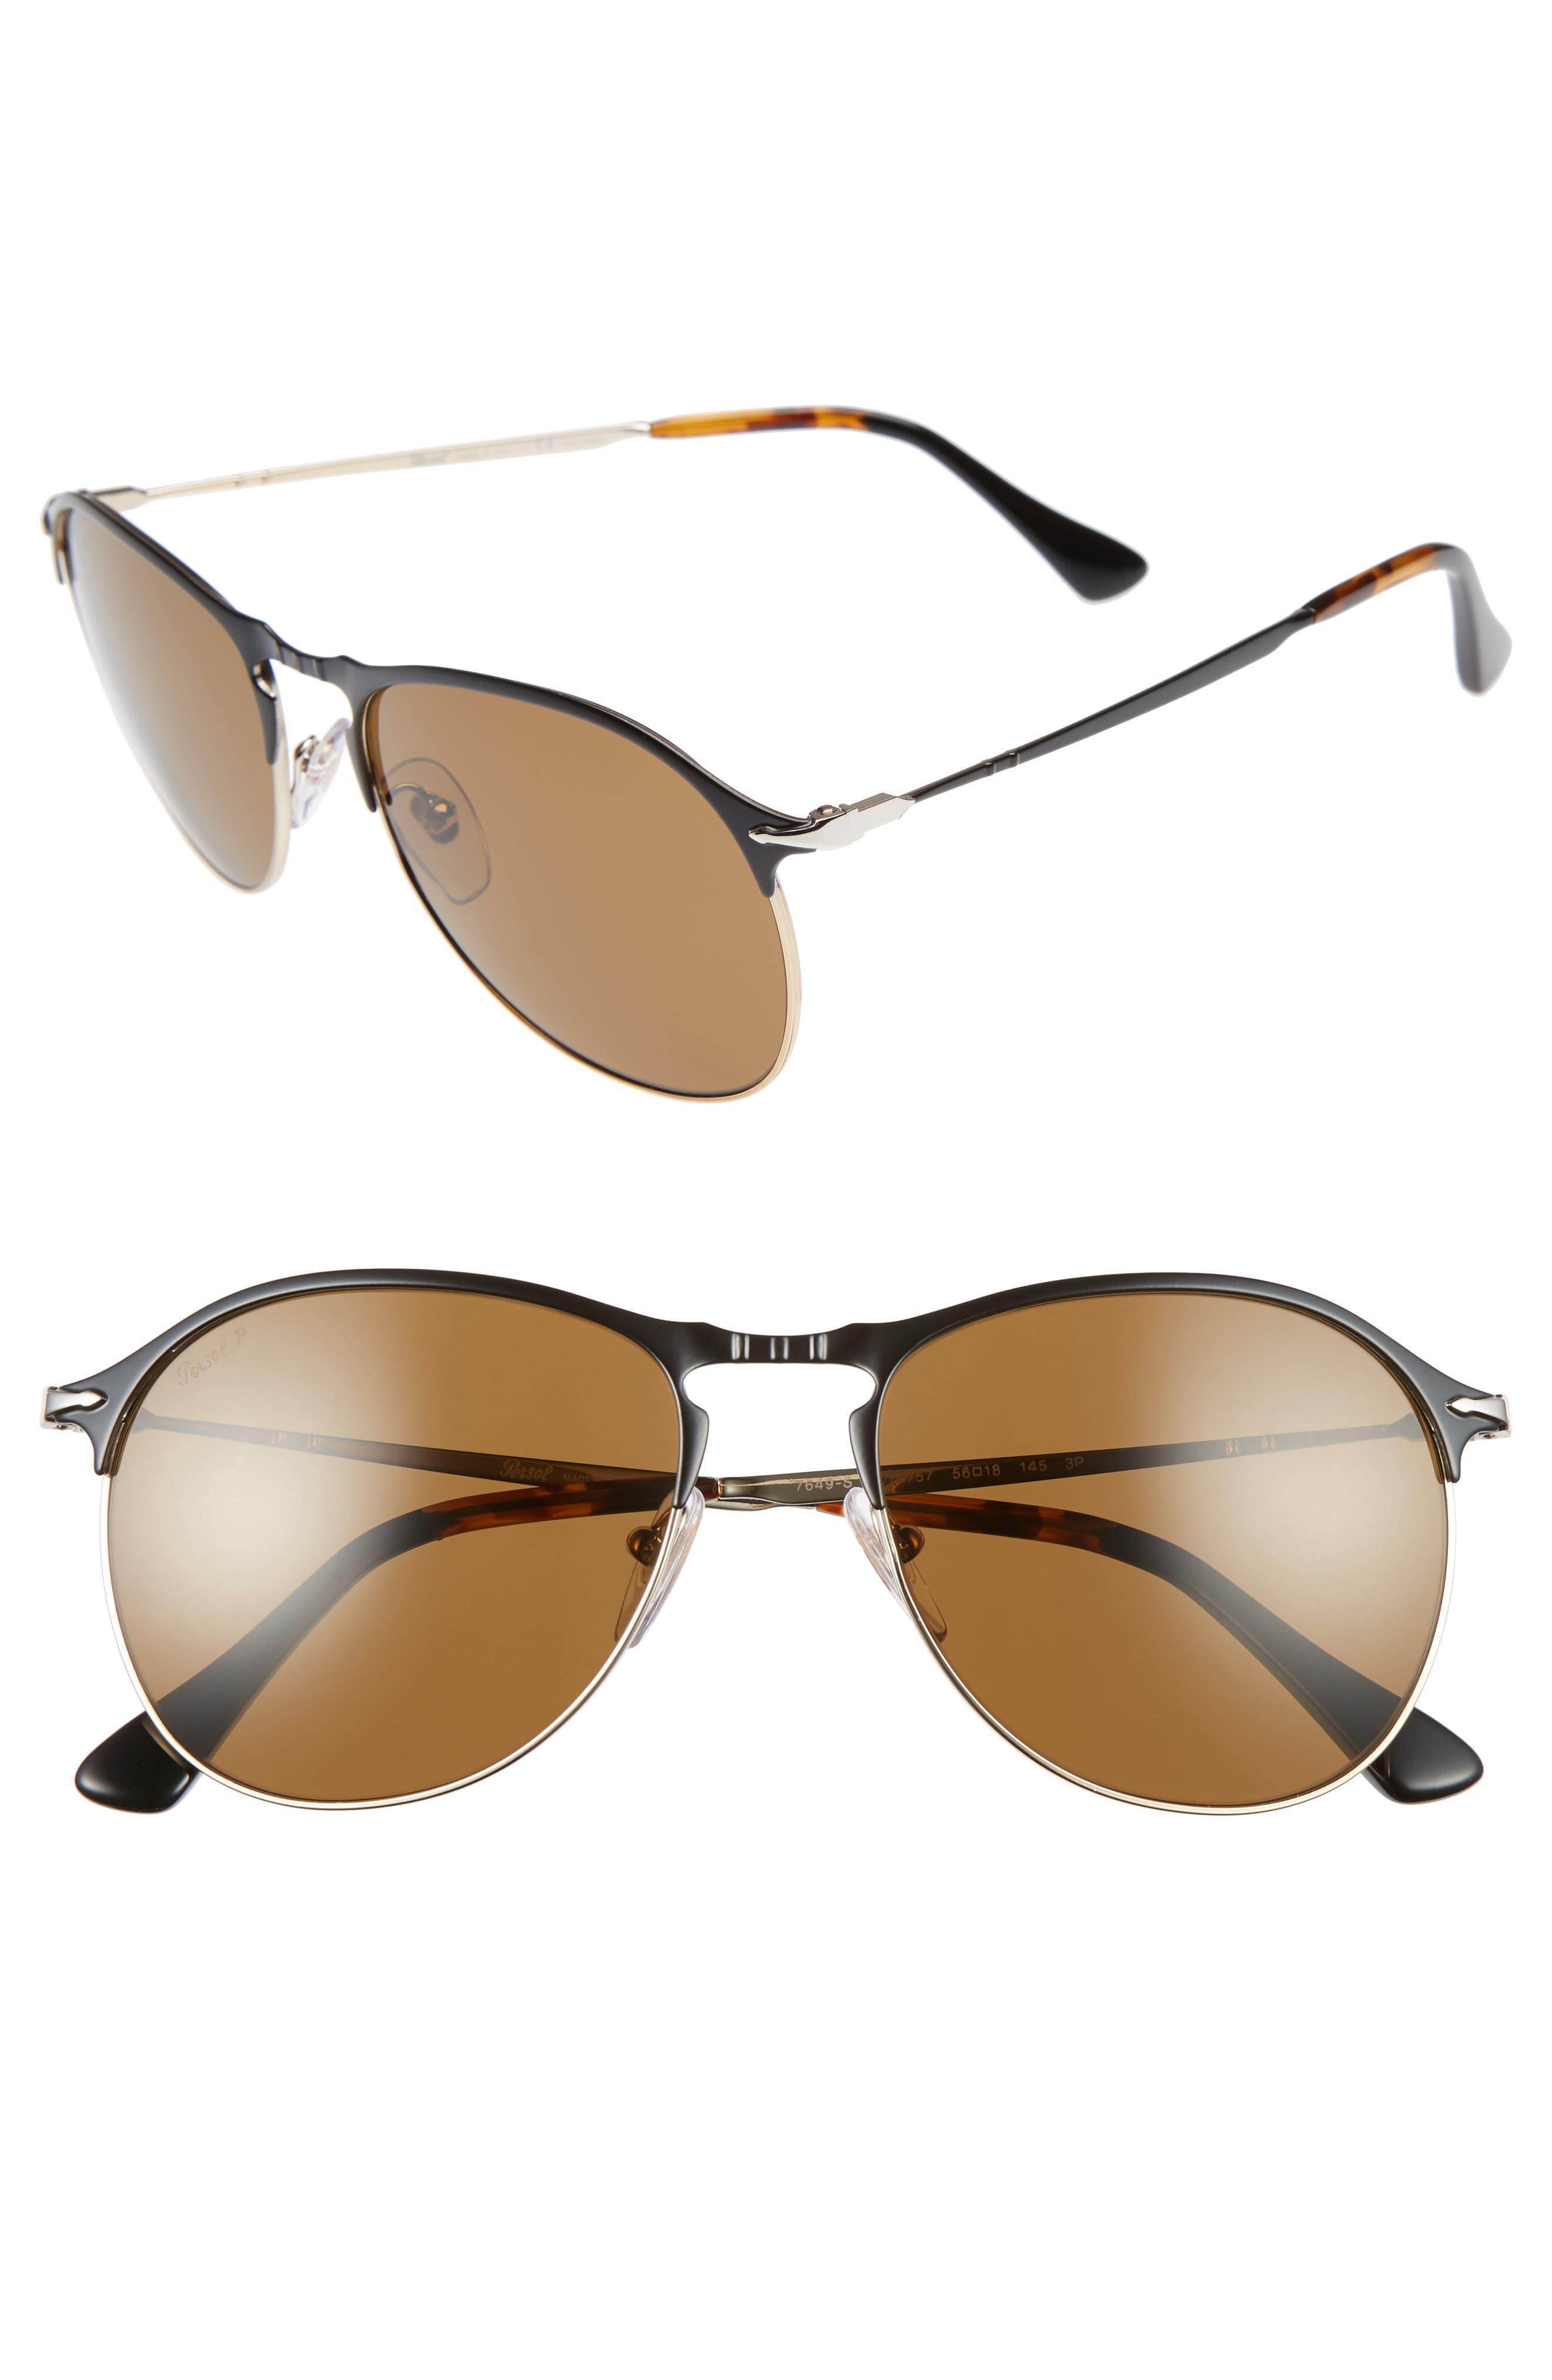 Sartoria 56mm Polarized Aviator Sunglasses,                         Main,                         color, MATTE BLACK